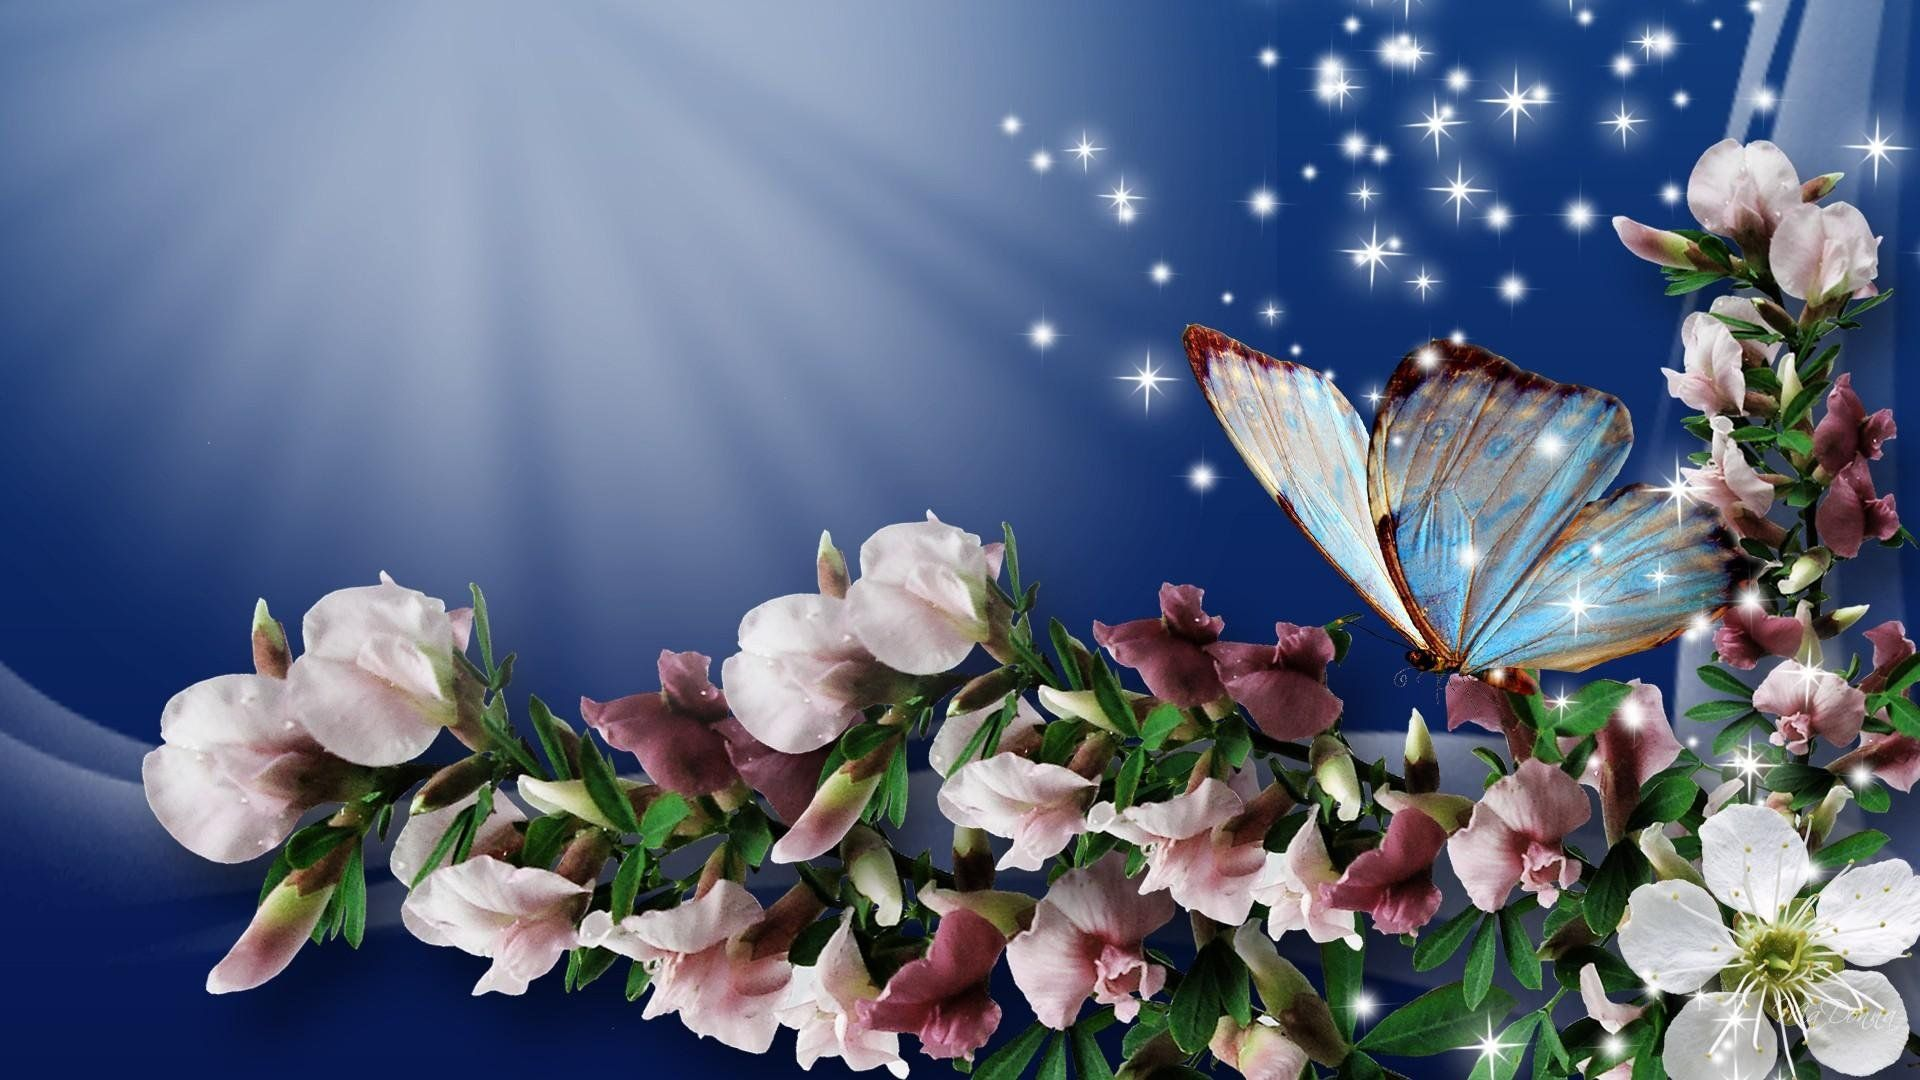 Spring Flowers And Butterflies Wallpaper Wide Spring wallpaper 1920x1080